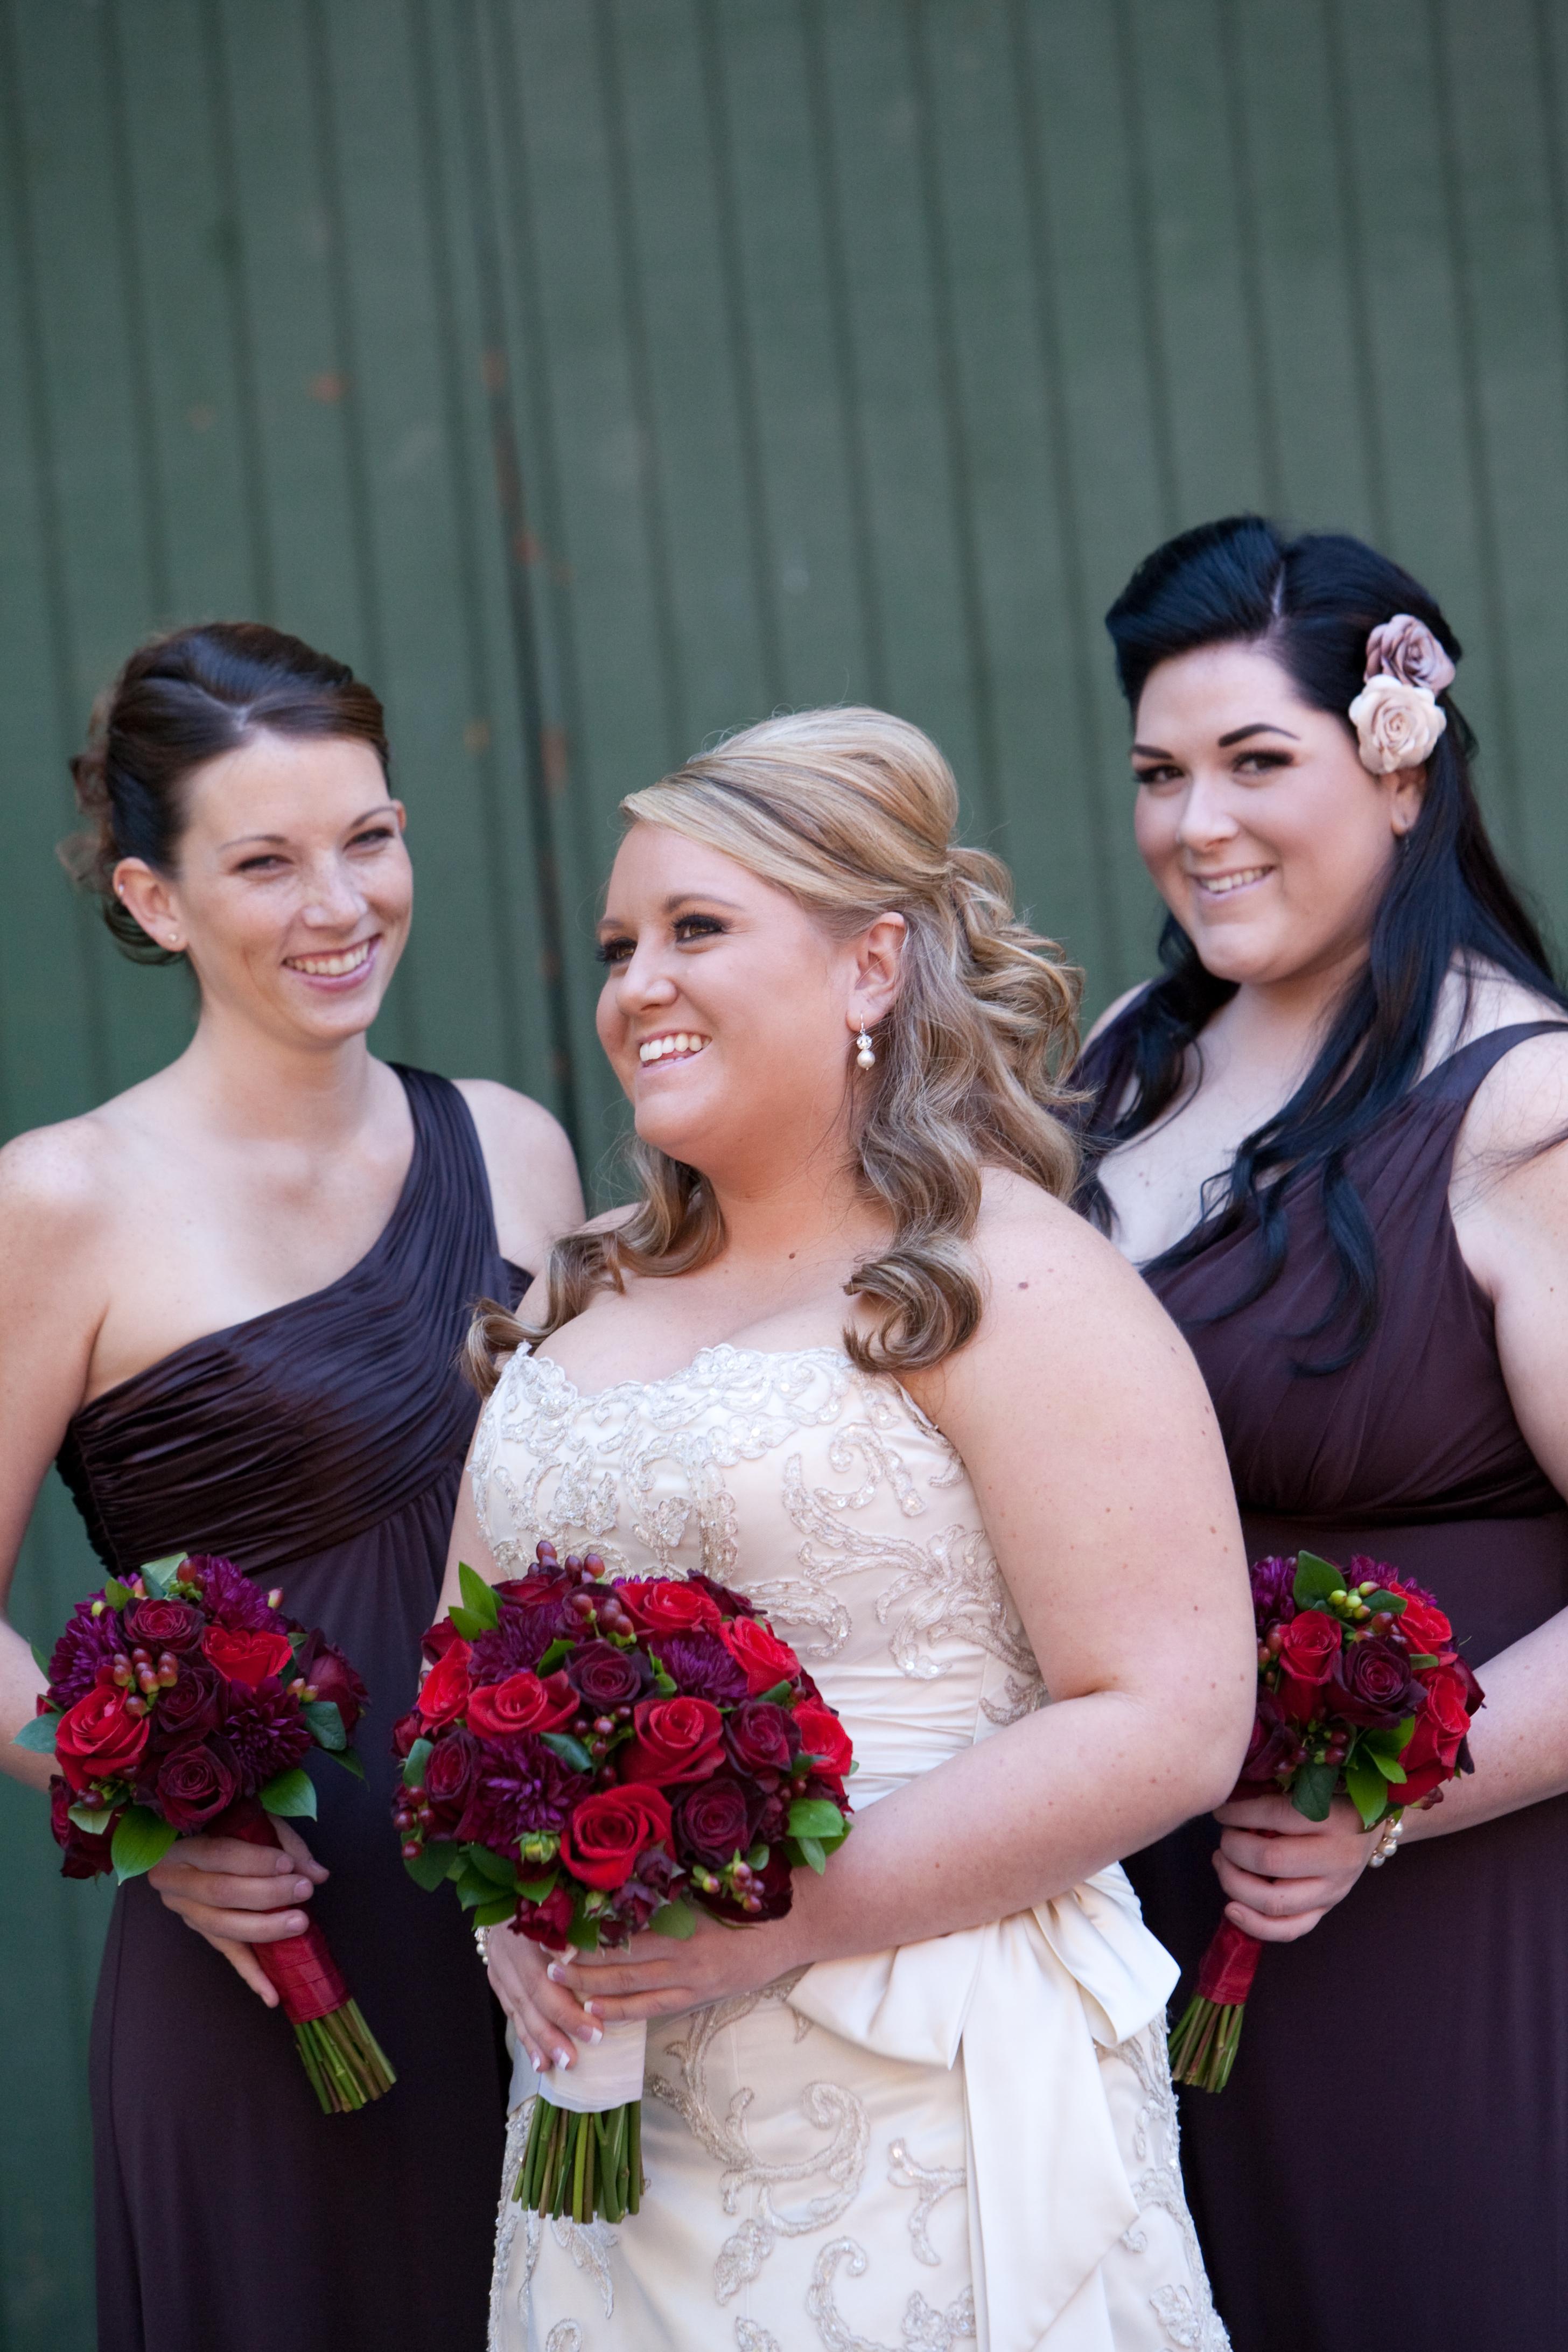 Flowers & Decor, Bridesmaids, Bridesmaids Dresses, Fashion, red, brown, Bridesmaid Bouquets, Flowers, Flower Wedding Dresses